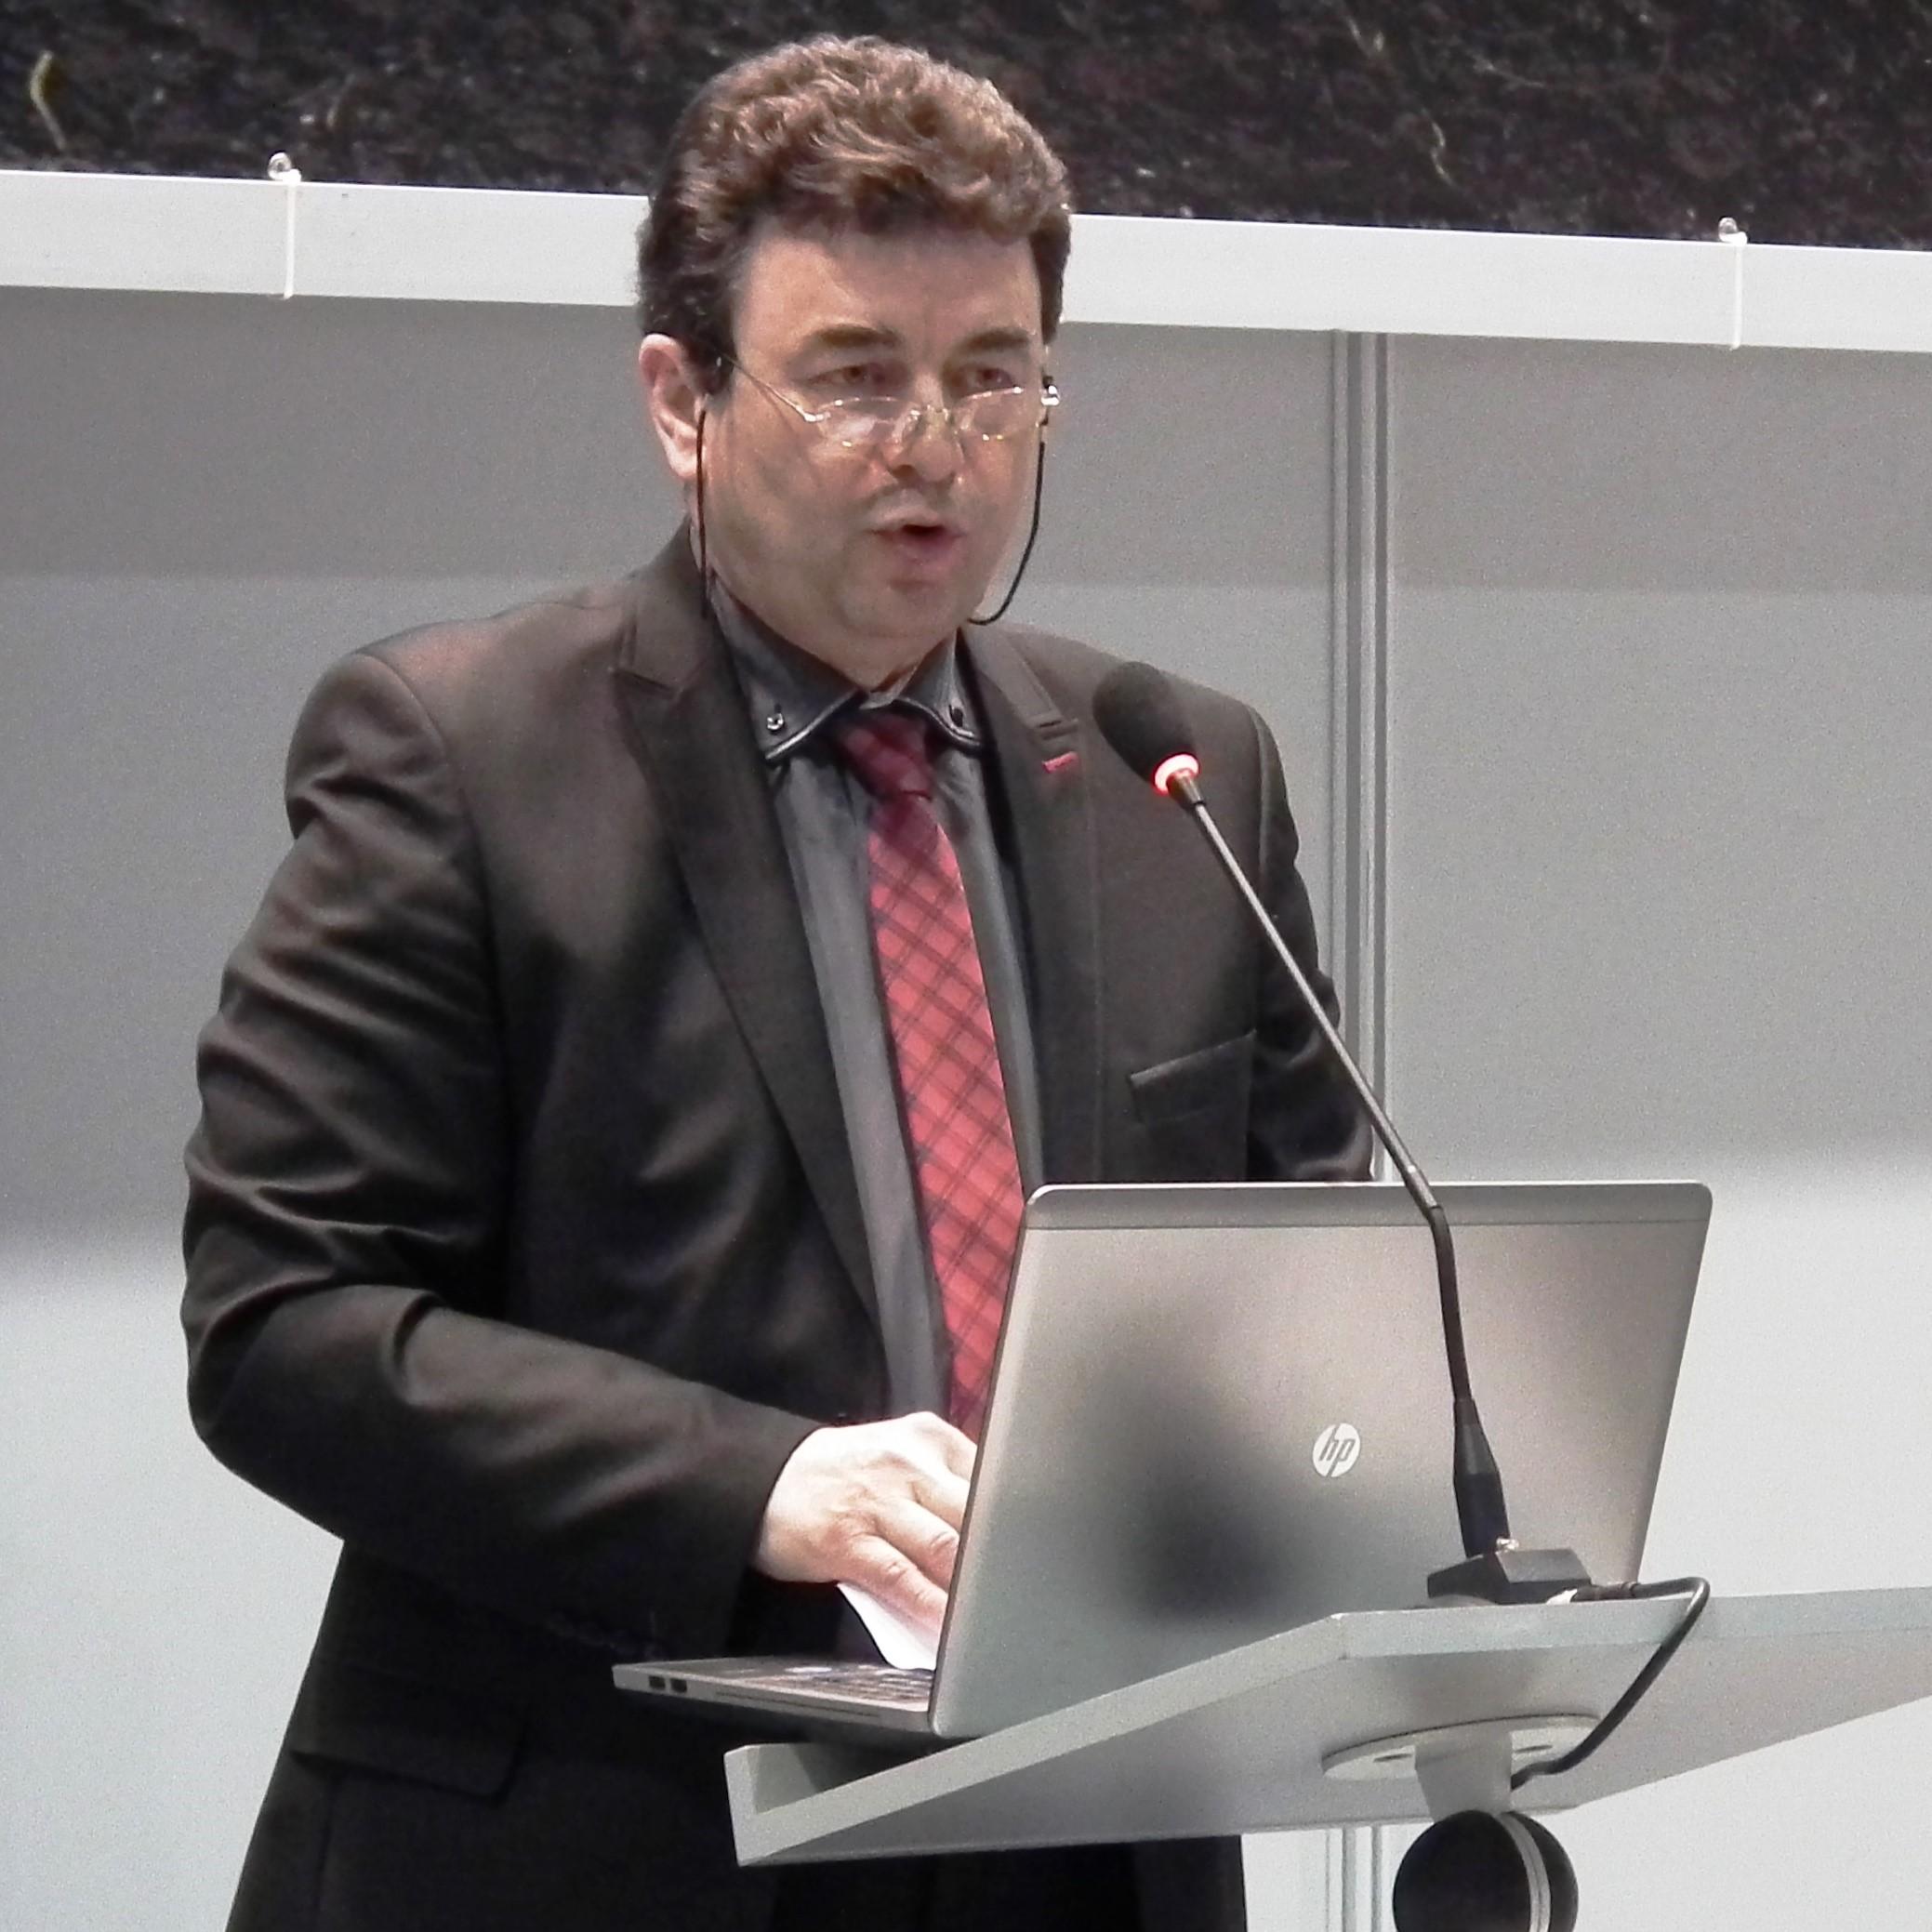 Amir Kazic